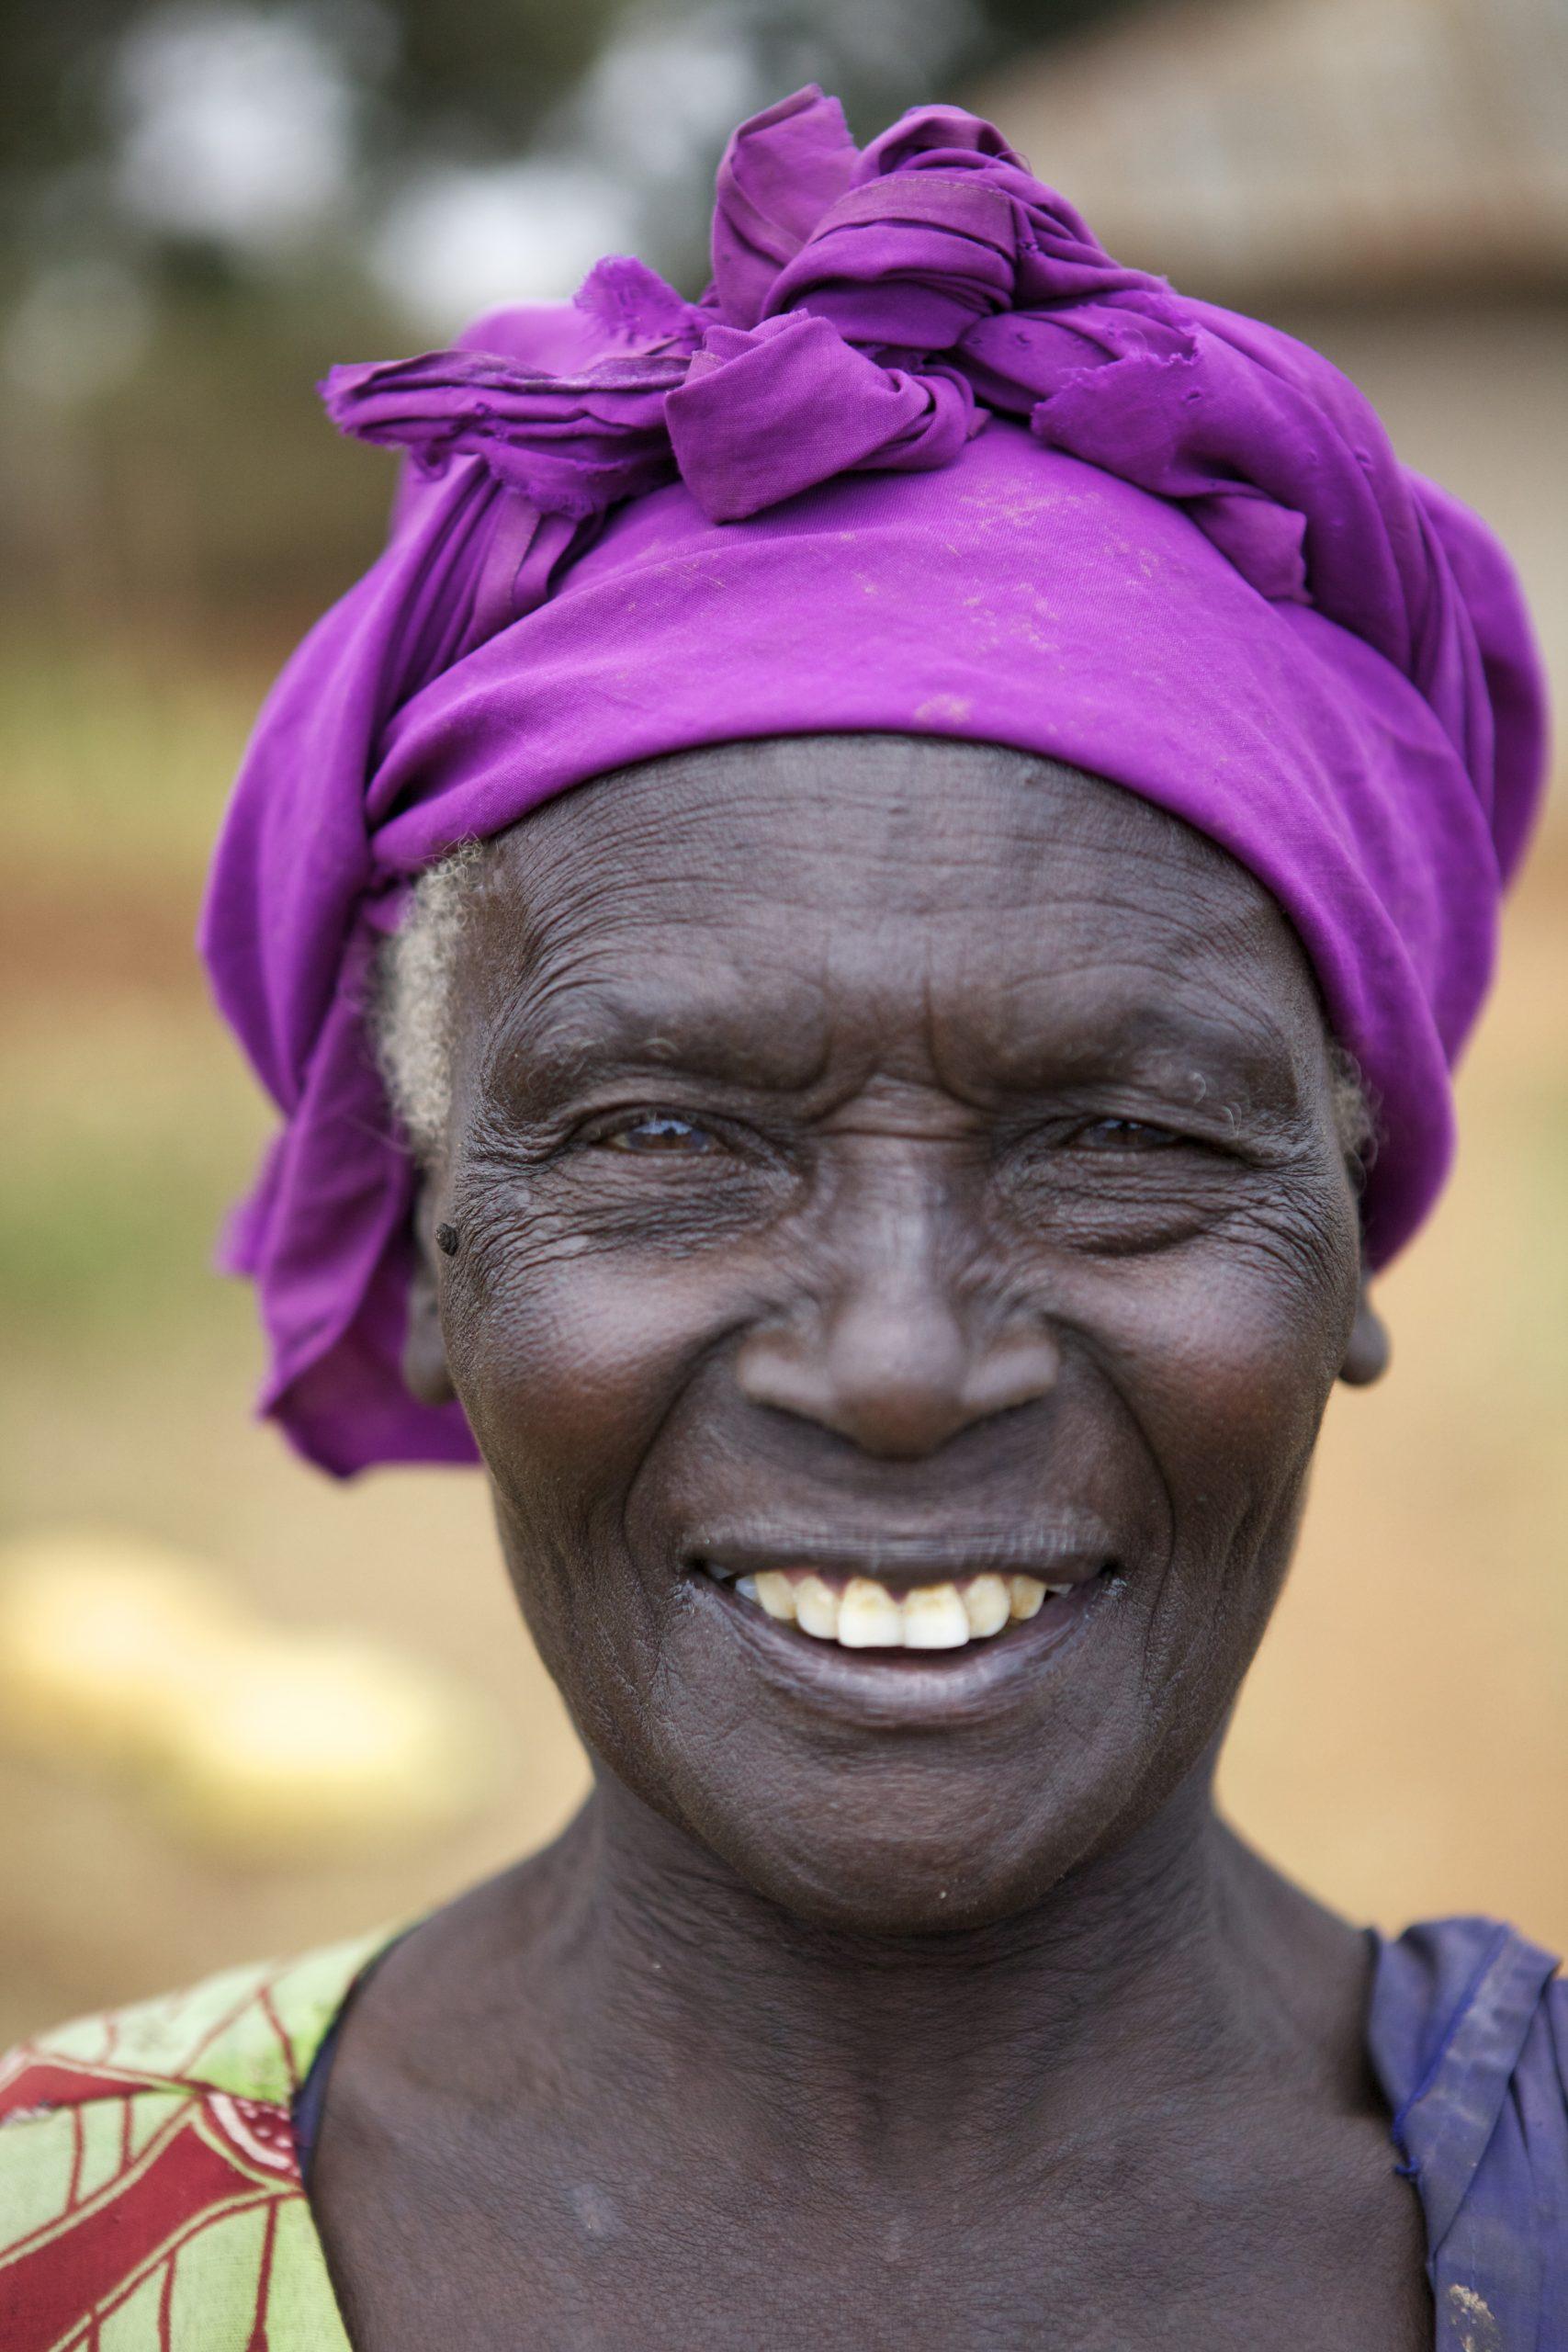 (c) Frederic Courbet/HelpAge International 2012Mama BrigitaSouth AlegoAround 64 years old